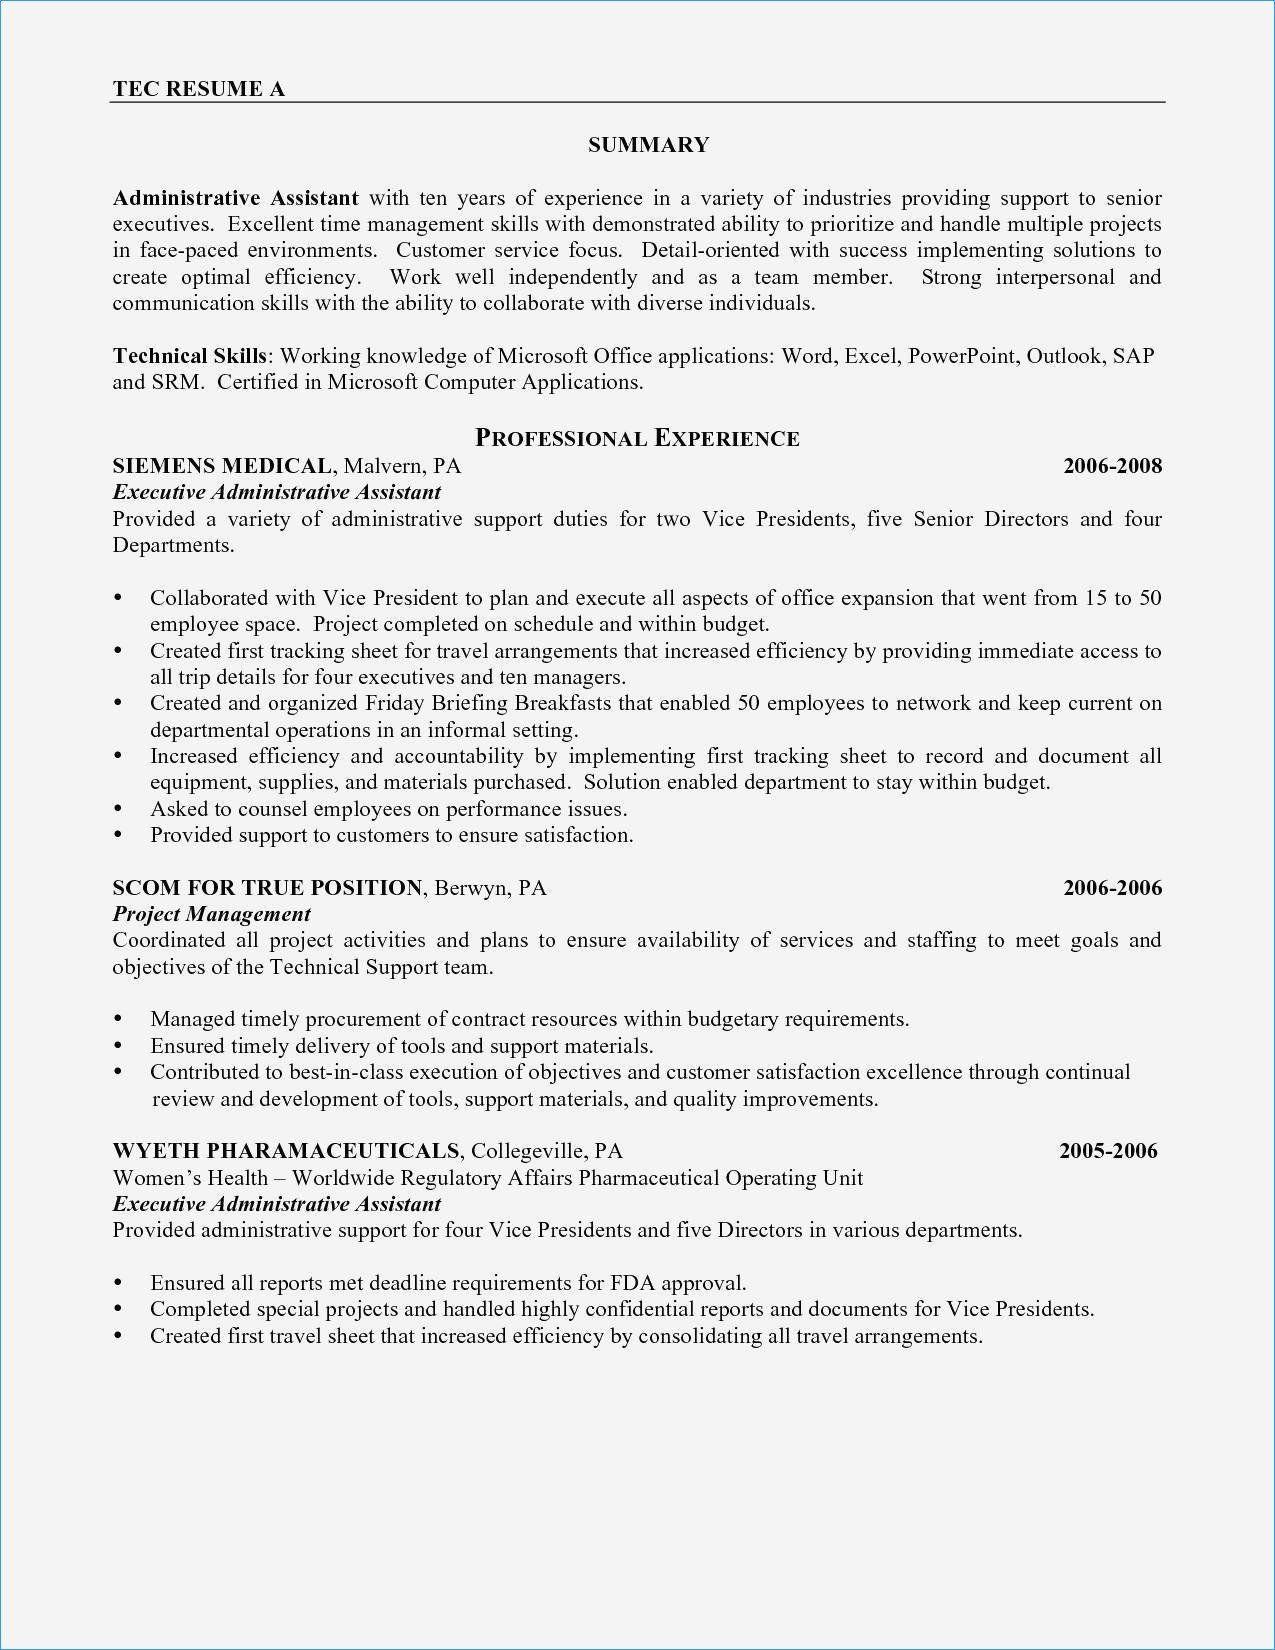 Customer Service Resume Samples Free Elegant New Best Cv Example Resume Skills Resume Summary Examples Cover Letter For Resume